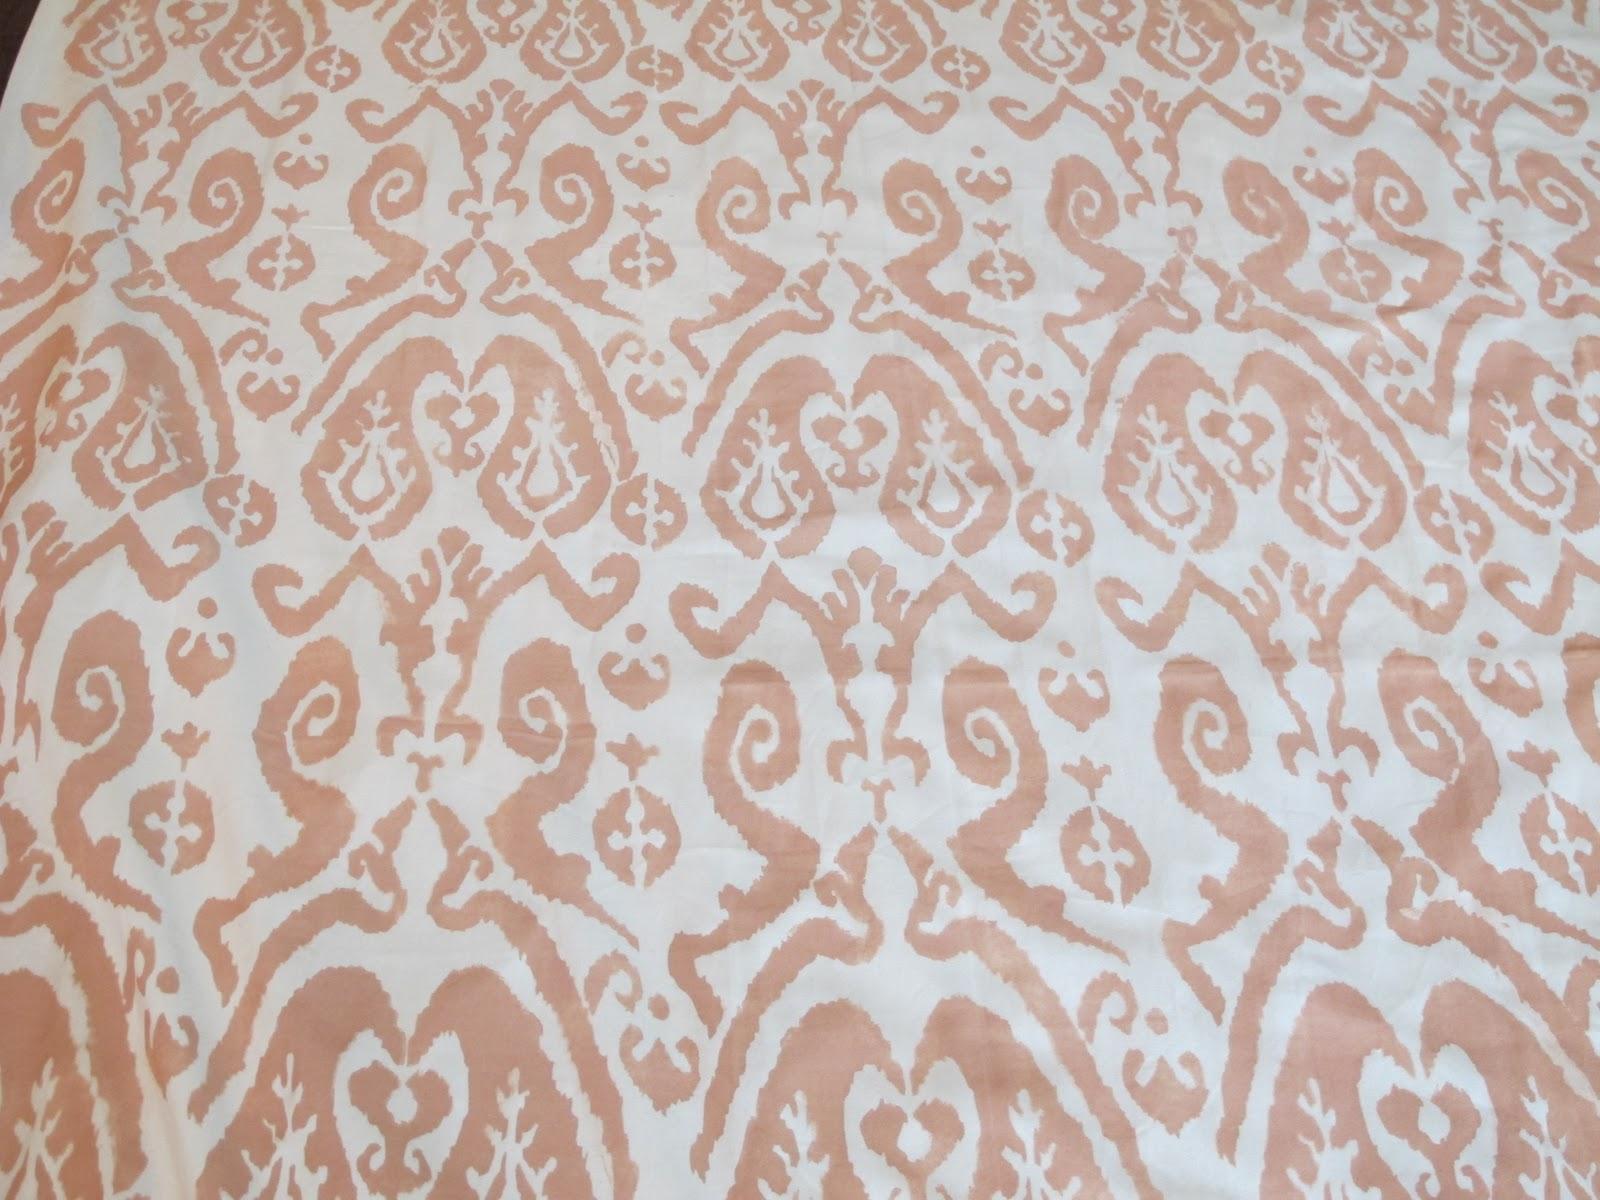 OliveLeaf Ikat Stencils Amber Interiors